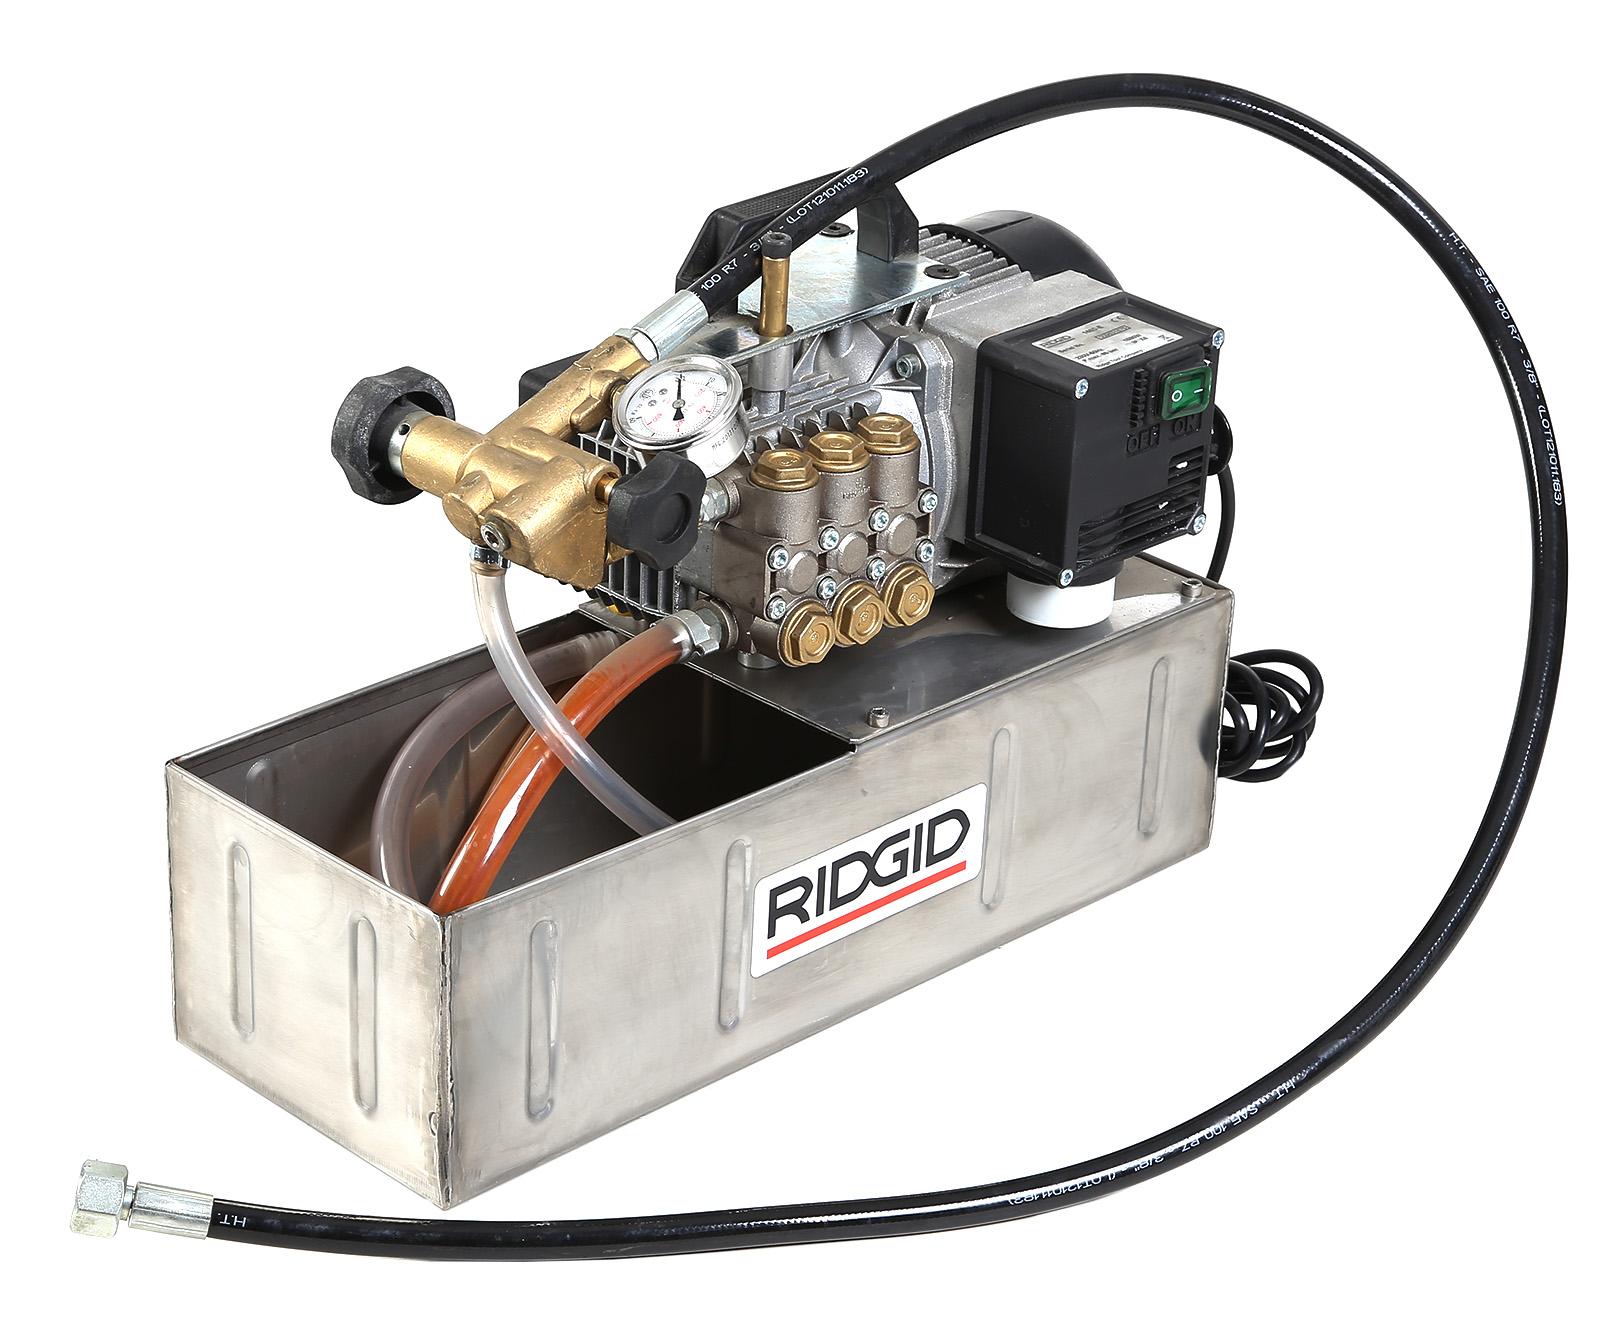 Опрессовщик Ridgid 1460-Е 19021